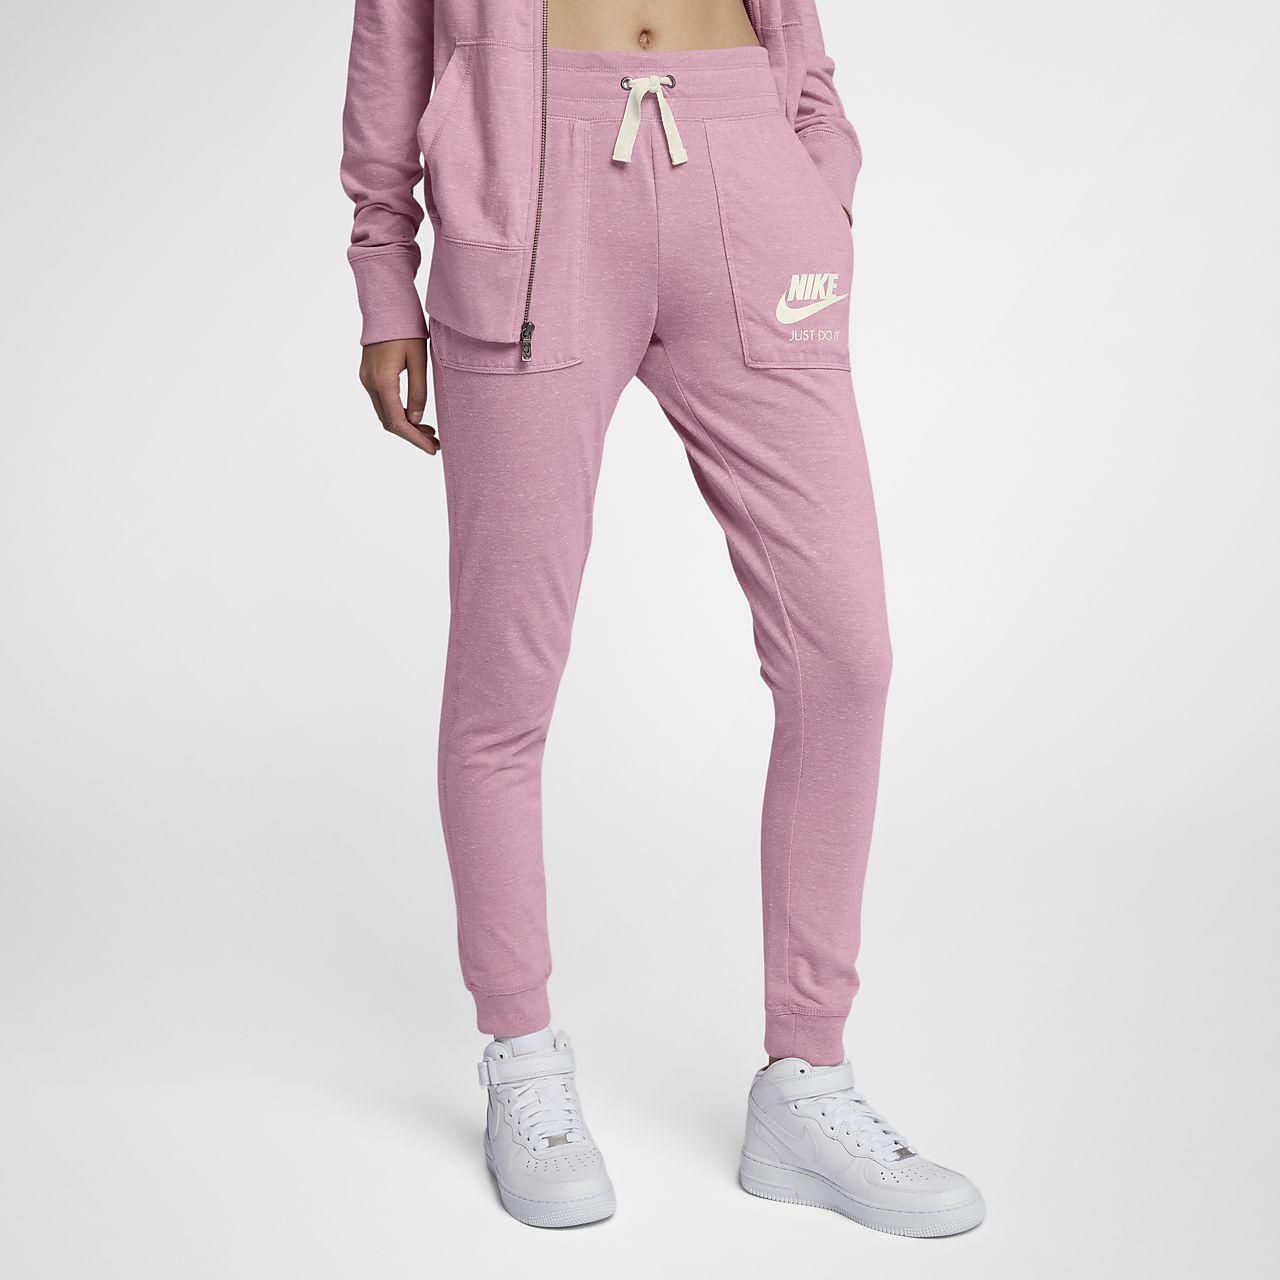 ... Nike Sportswear Gym Vintage Women's Pants